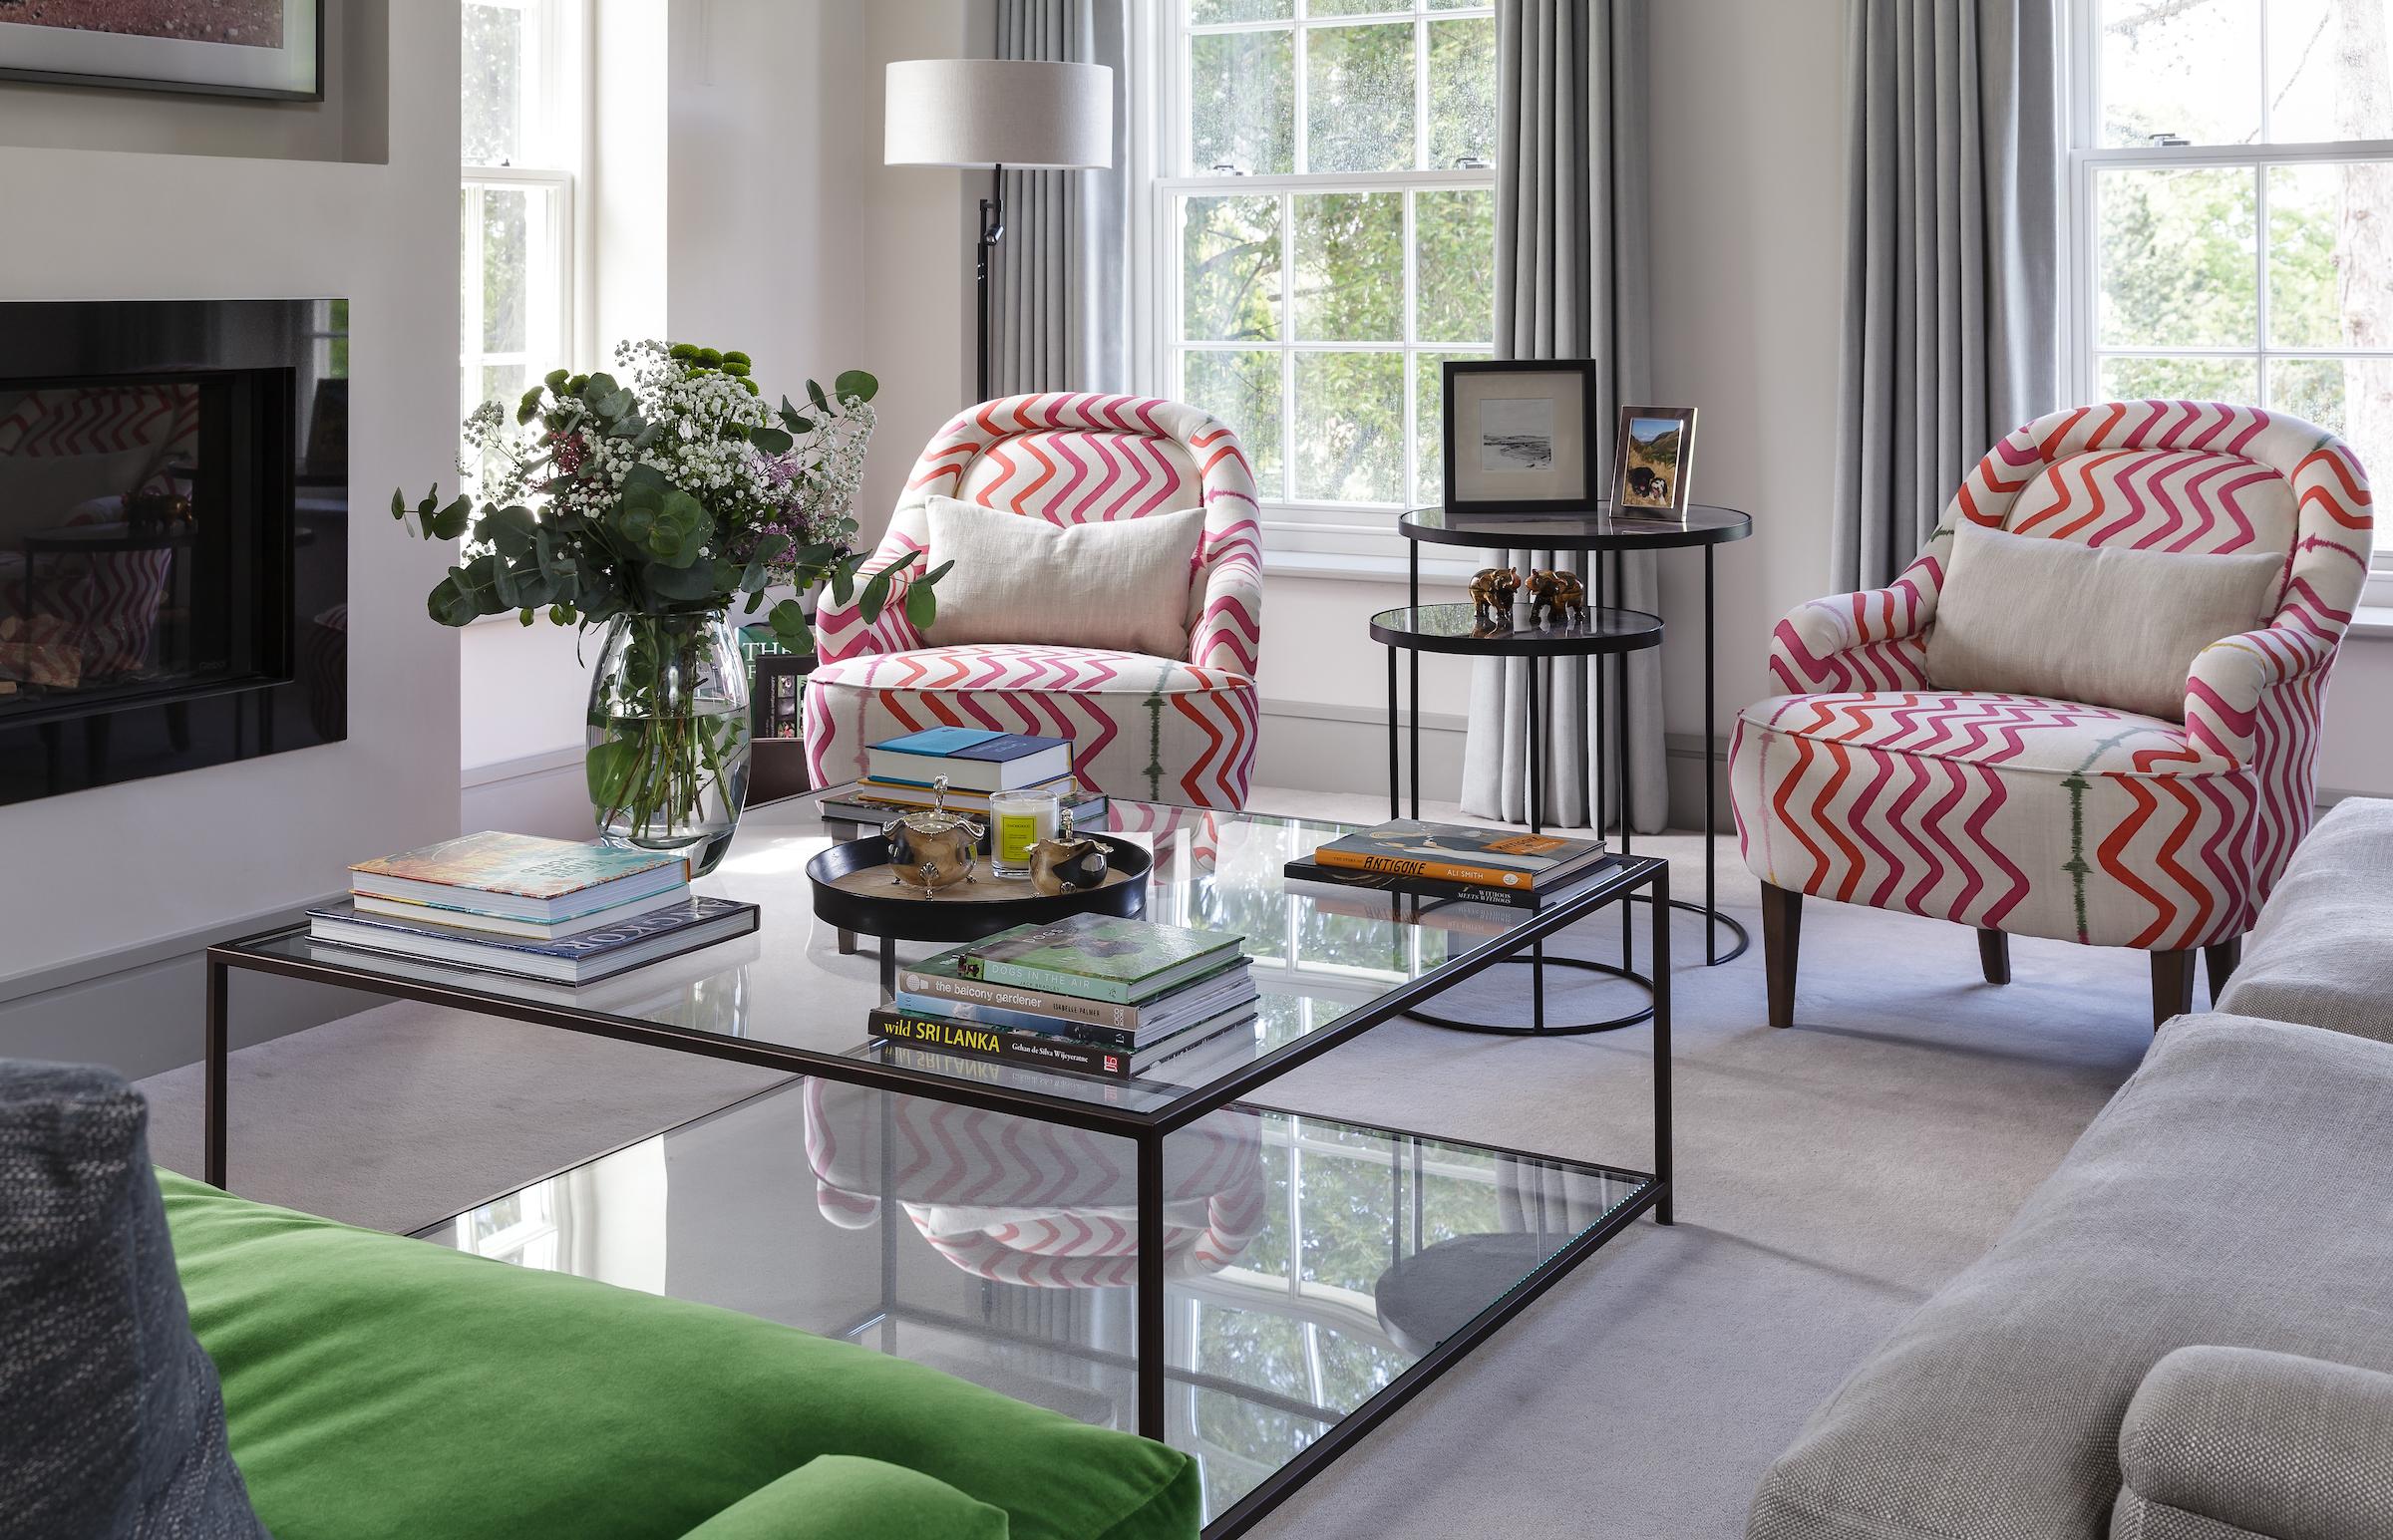 Kit Kemp Rick Rack fabric on armchairs interior Design by Hilary White